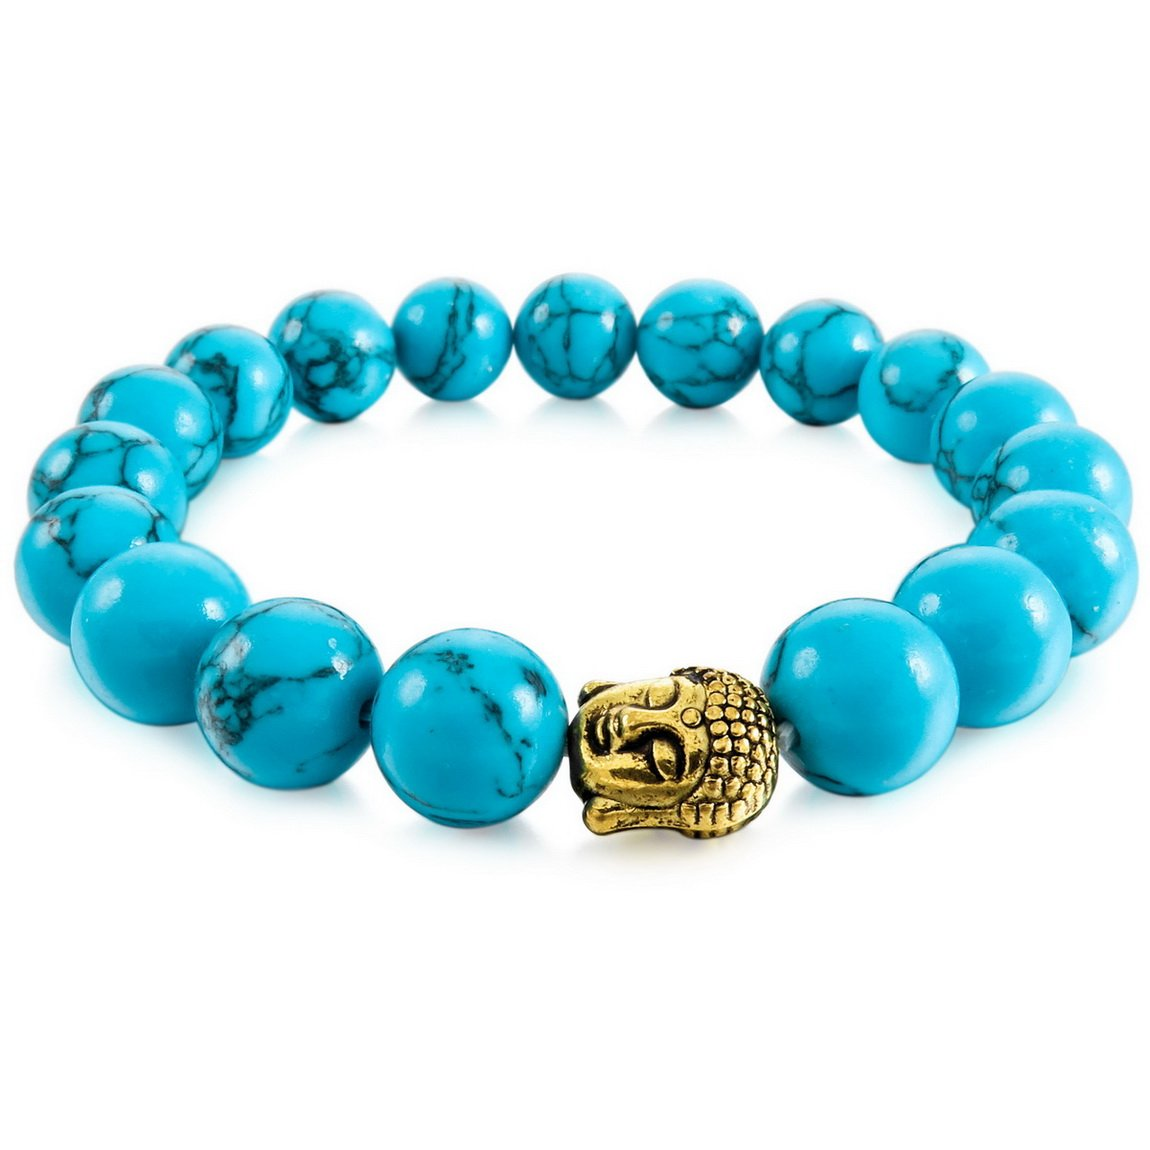 INBLUE Men,Women's 10mm Alloy Energy Bracelet Link Wrist Simulated Turquoise Blue Buddha Mala Bead Elastic